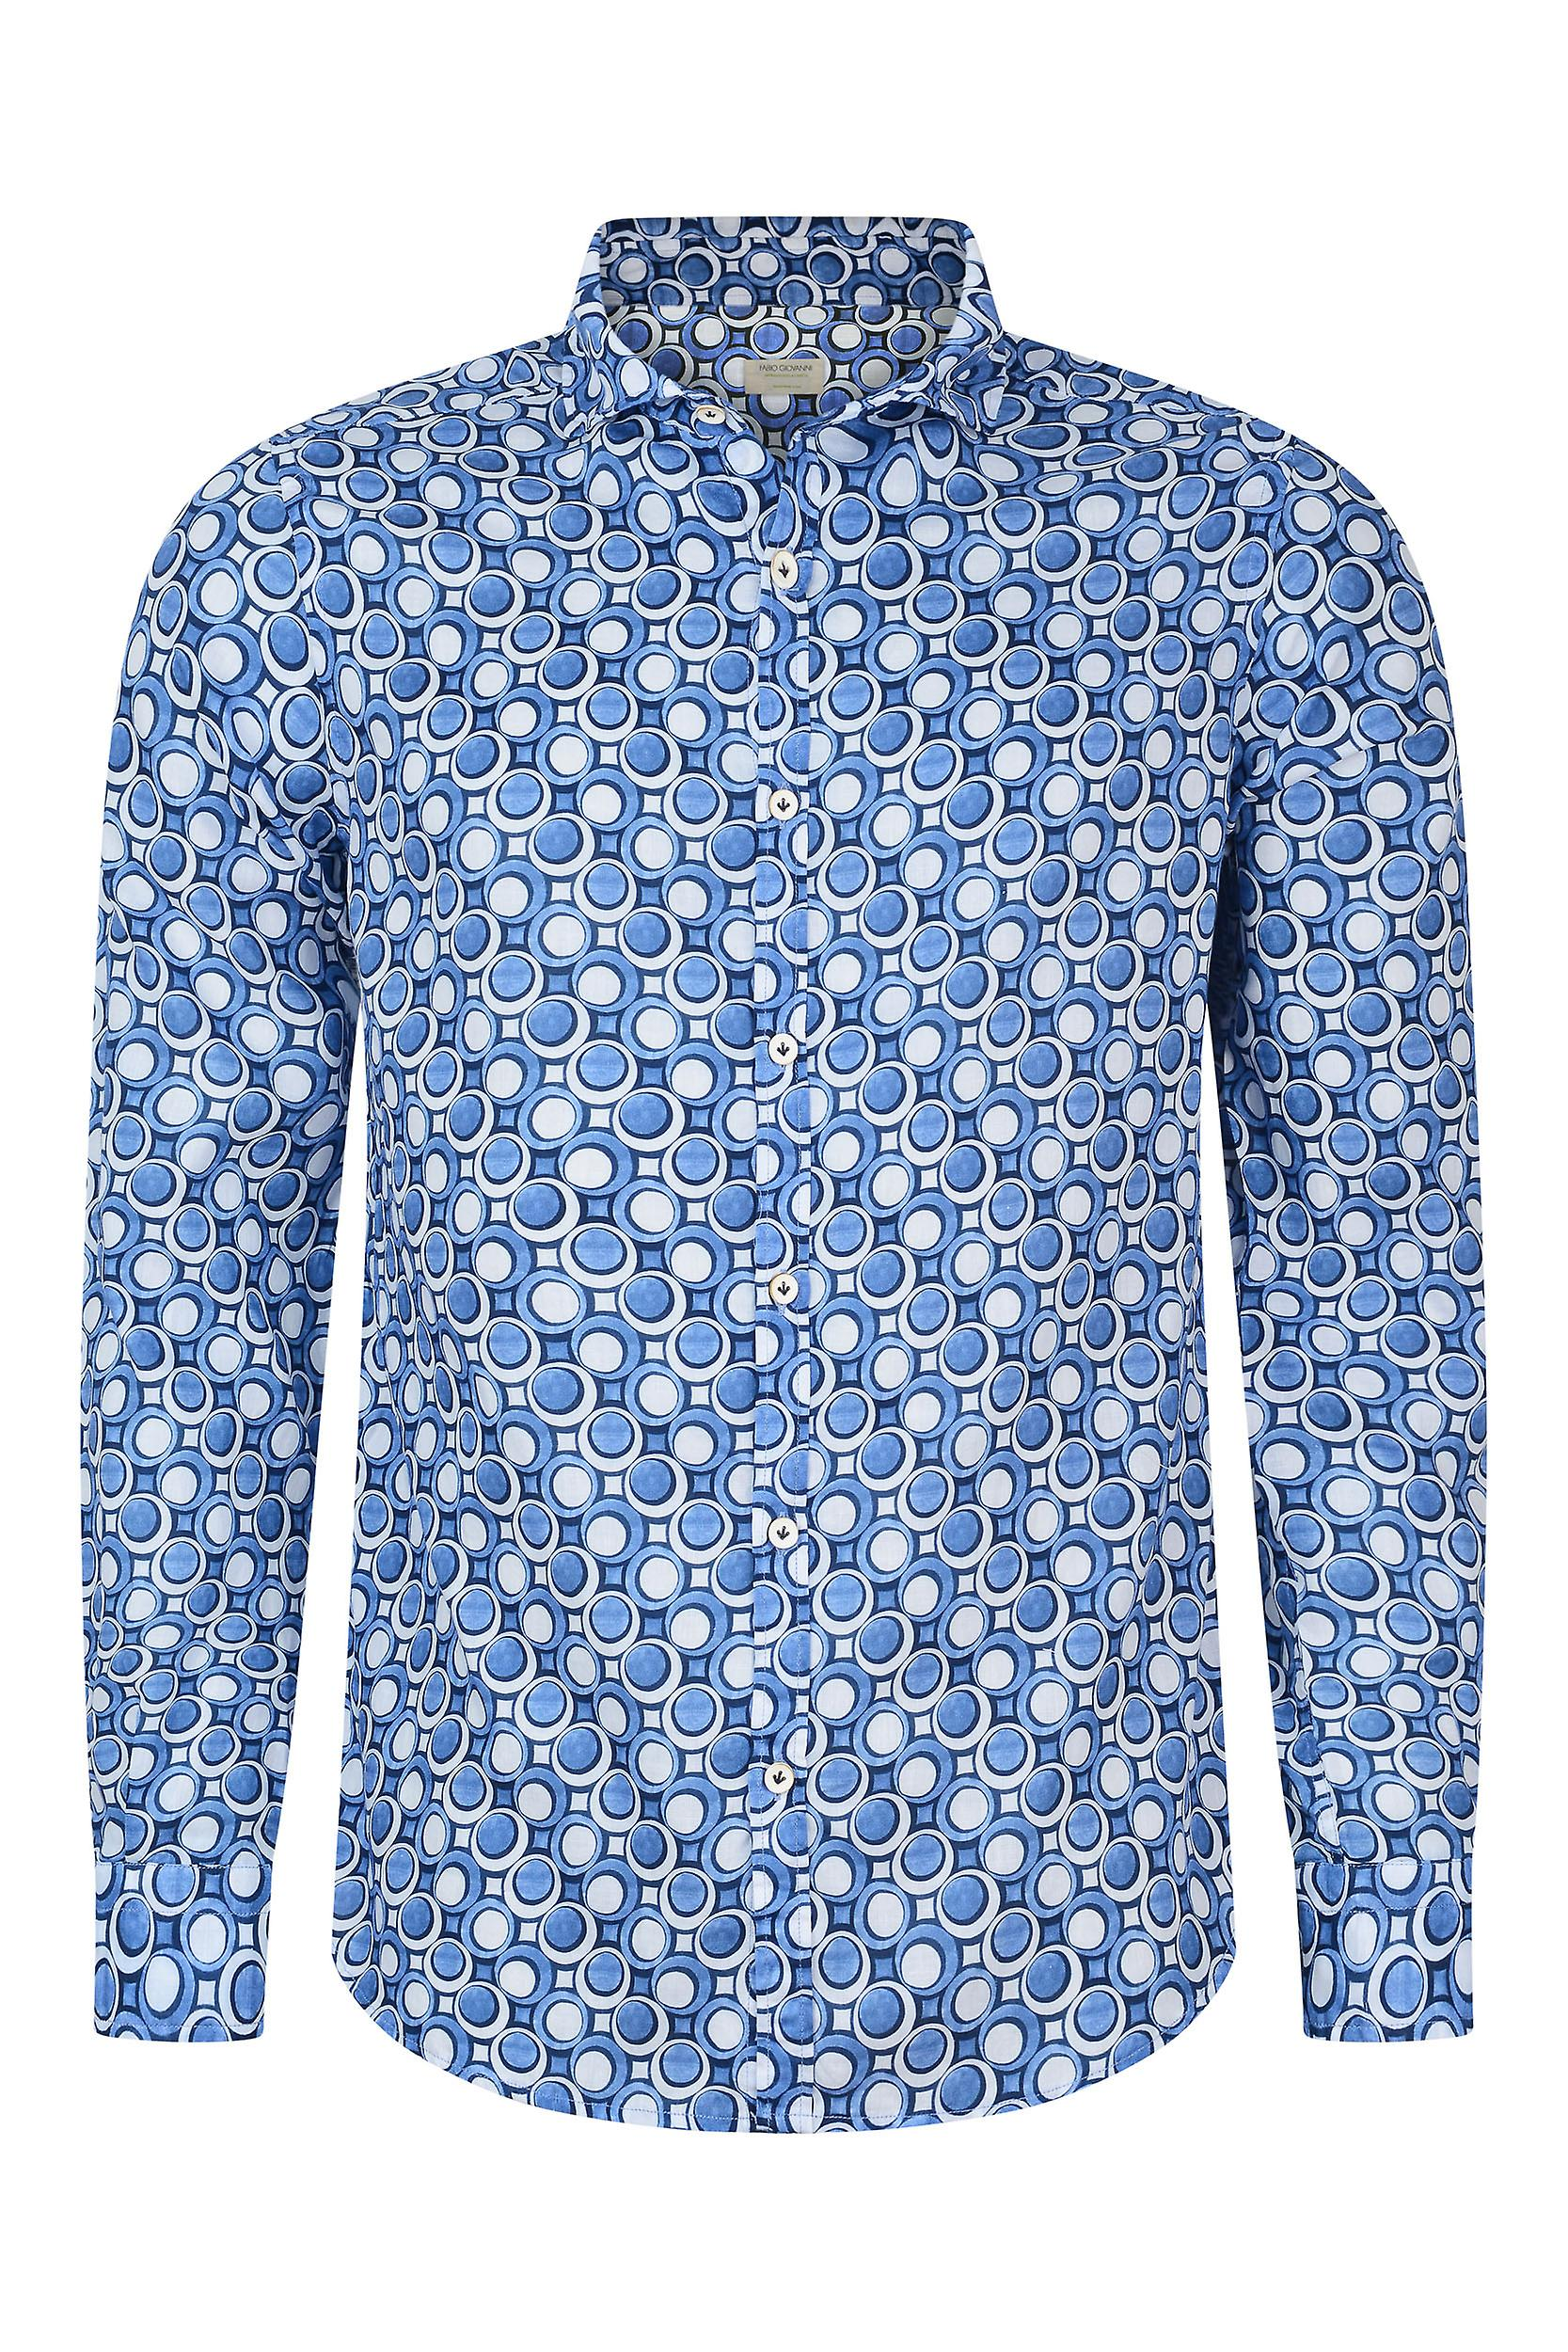 Fabio Giovanni Galatina Shirt - Mens Italian Casual Stylish Shirt 100% Cotton - Long Sleeve